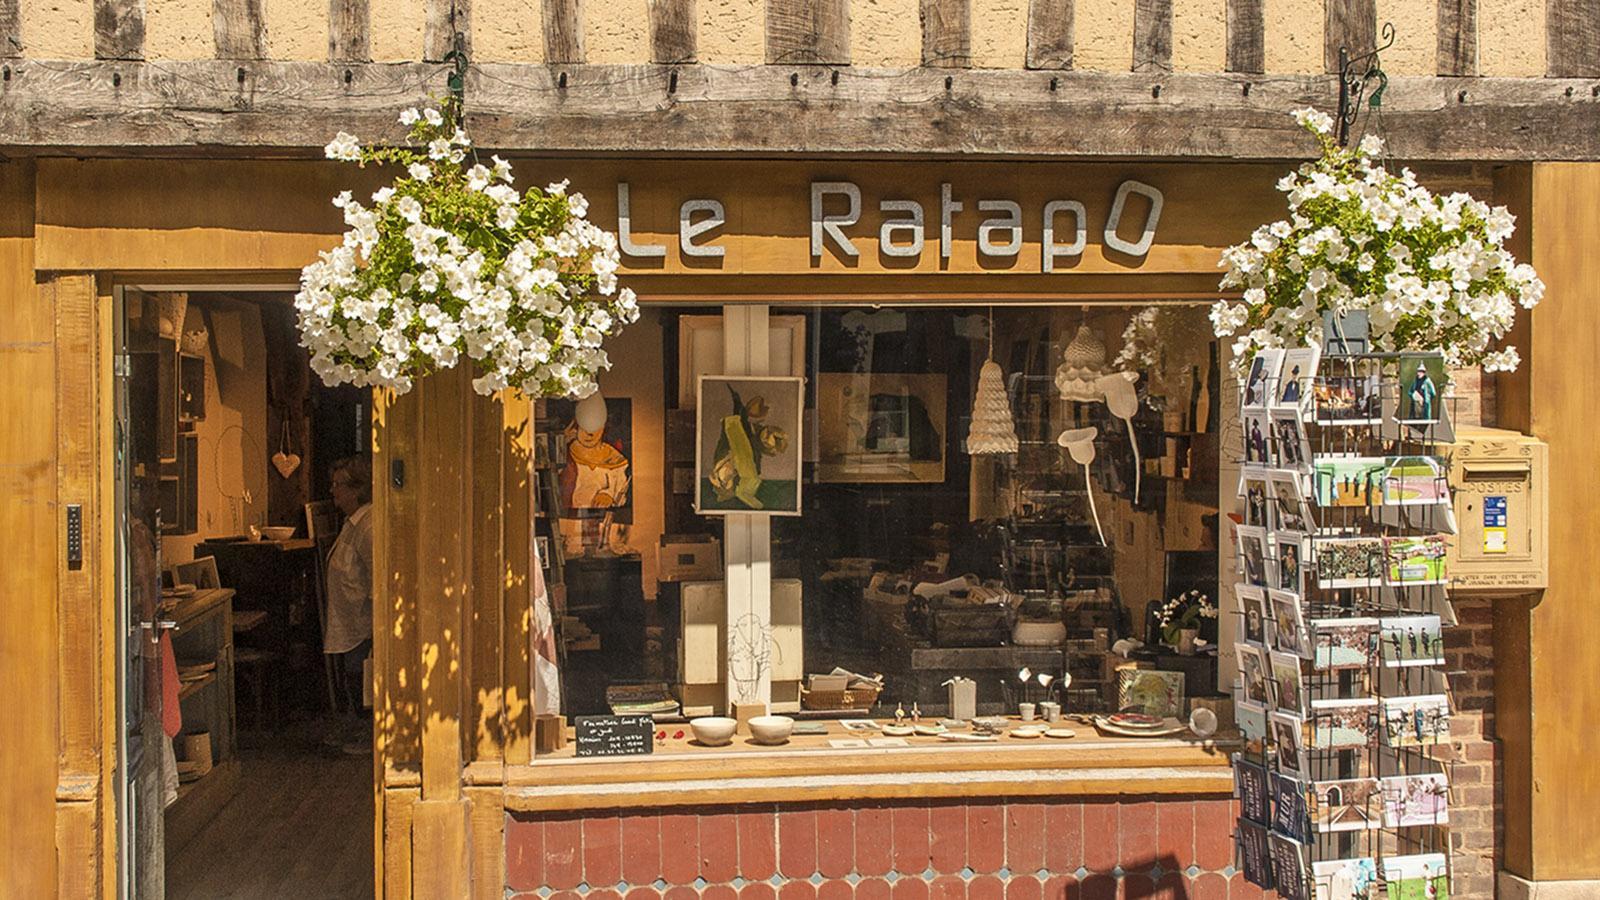 Les Andelys: Ratapo. Foto: Hilke Maunder